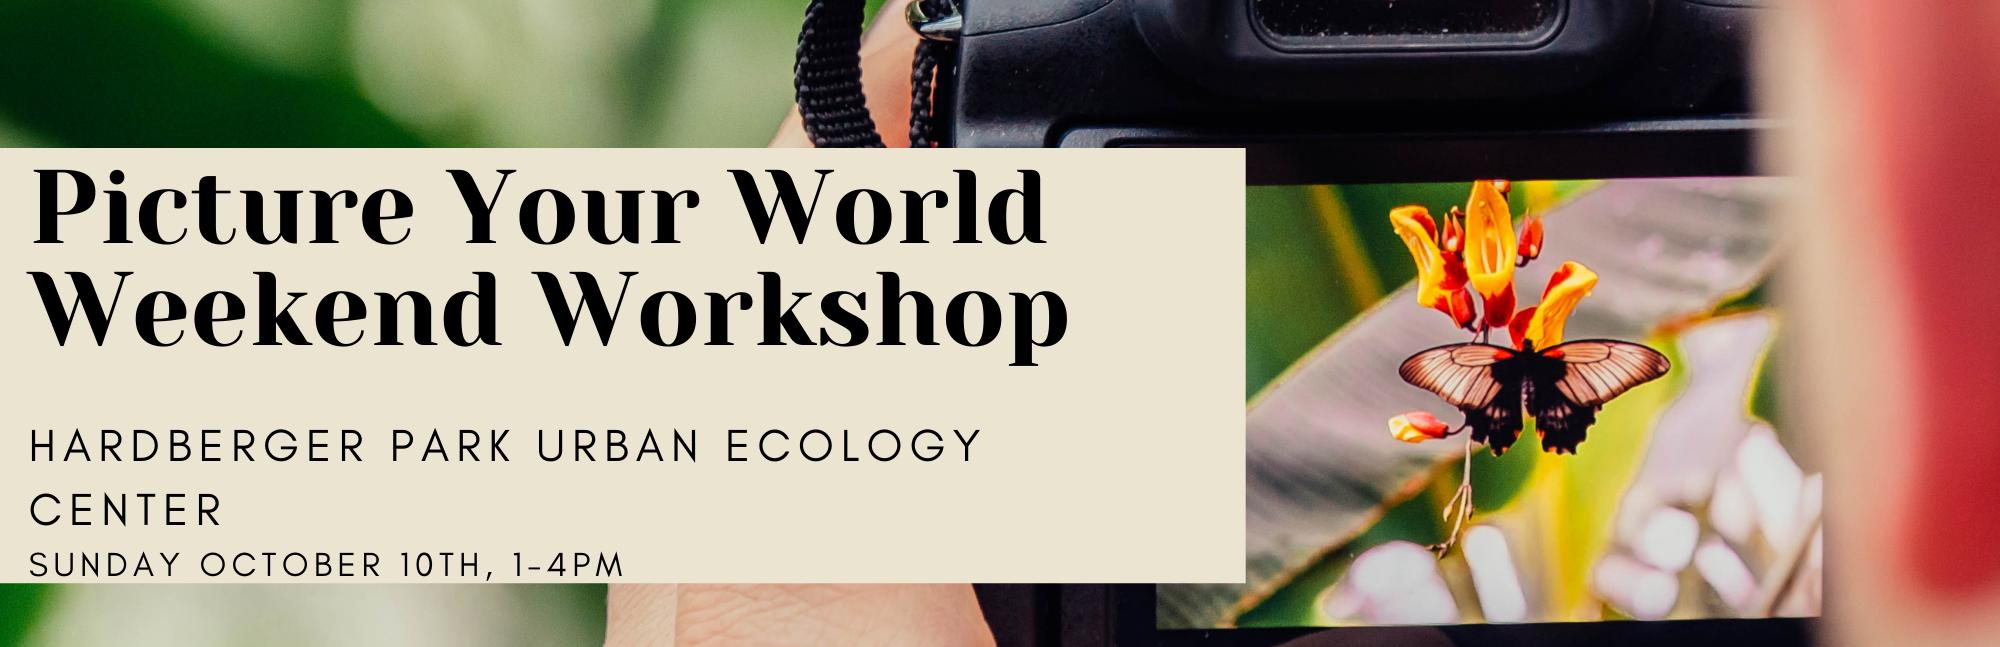 Picture Your World Weekend Workshops Bulverde Oaks 10.18.png